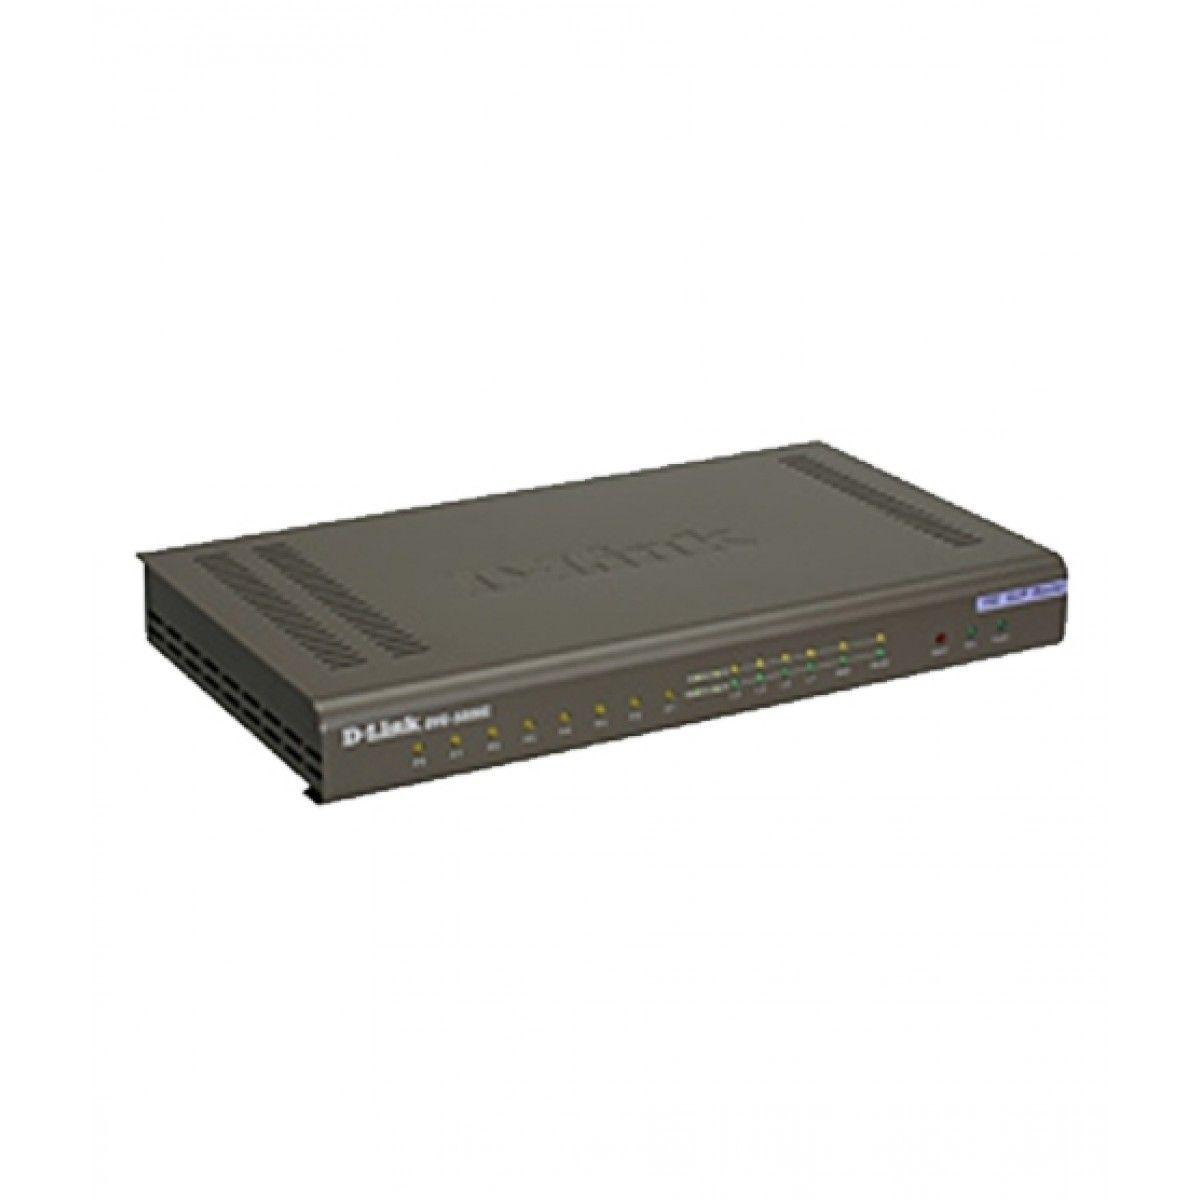 D-Link built-in 8 FXS VoIP Gateway DVG-5008S